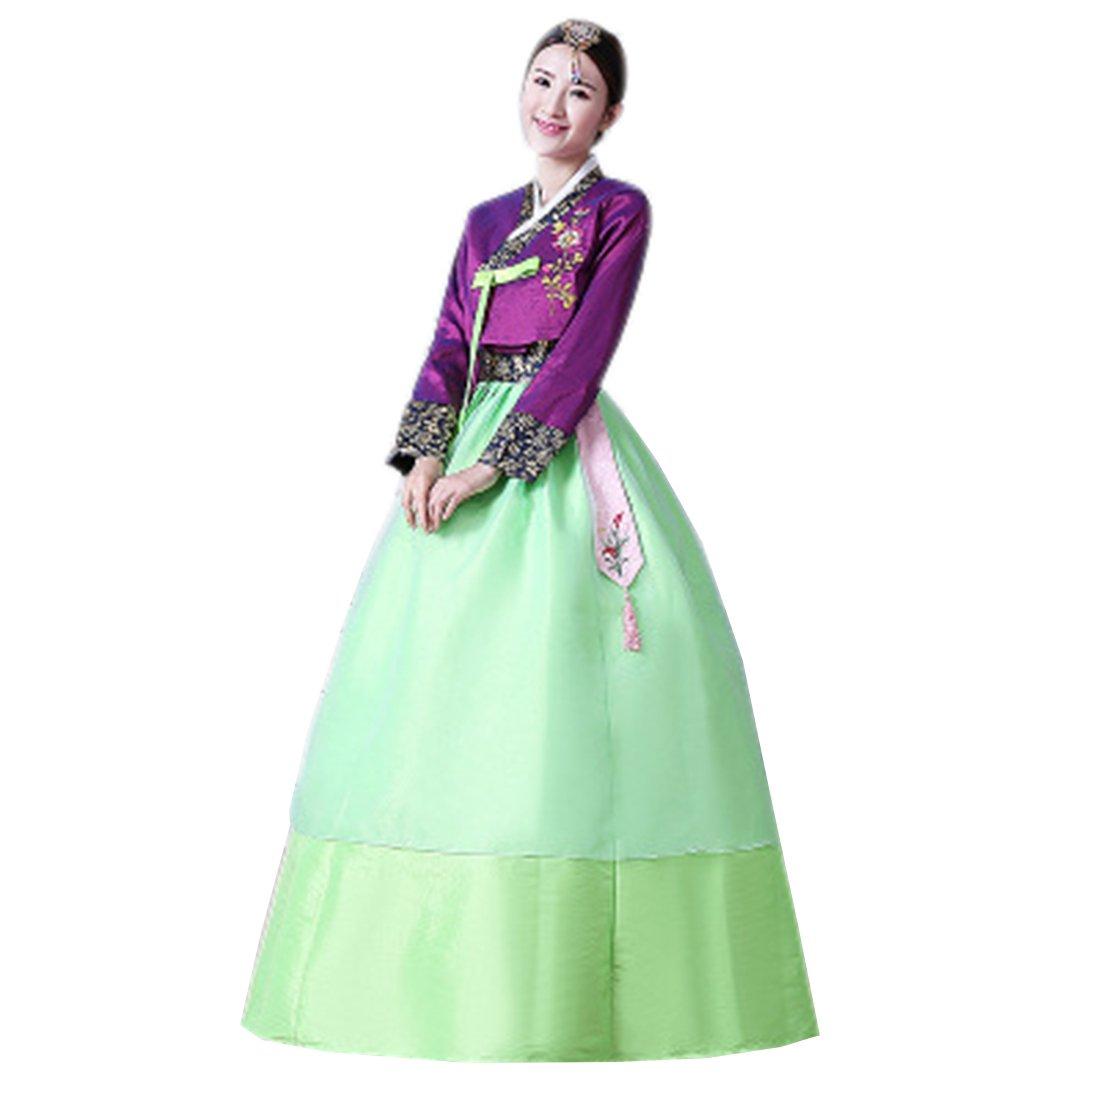 Ez-sofei Women's Korean Traditional Costumes Hanbok Dresses (L, Purple&Green)